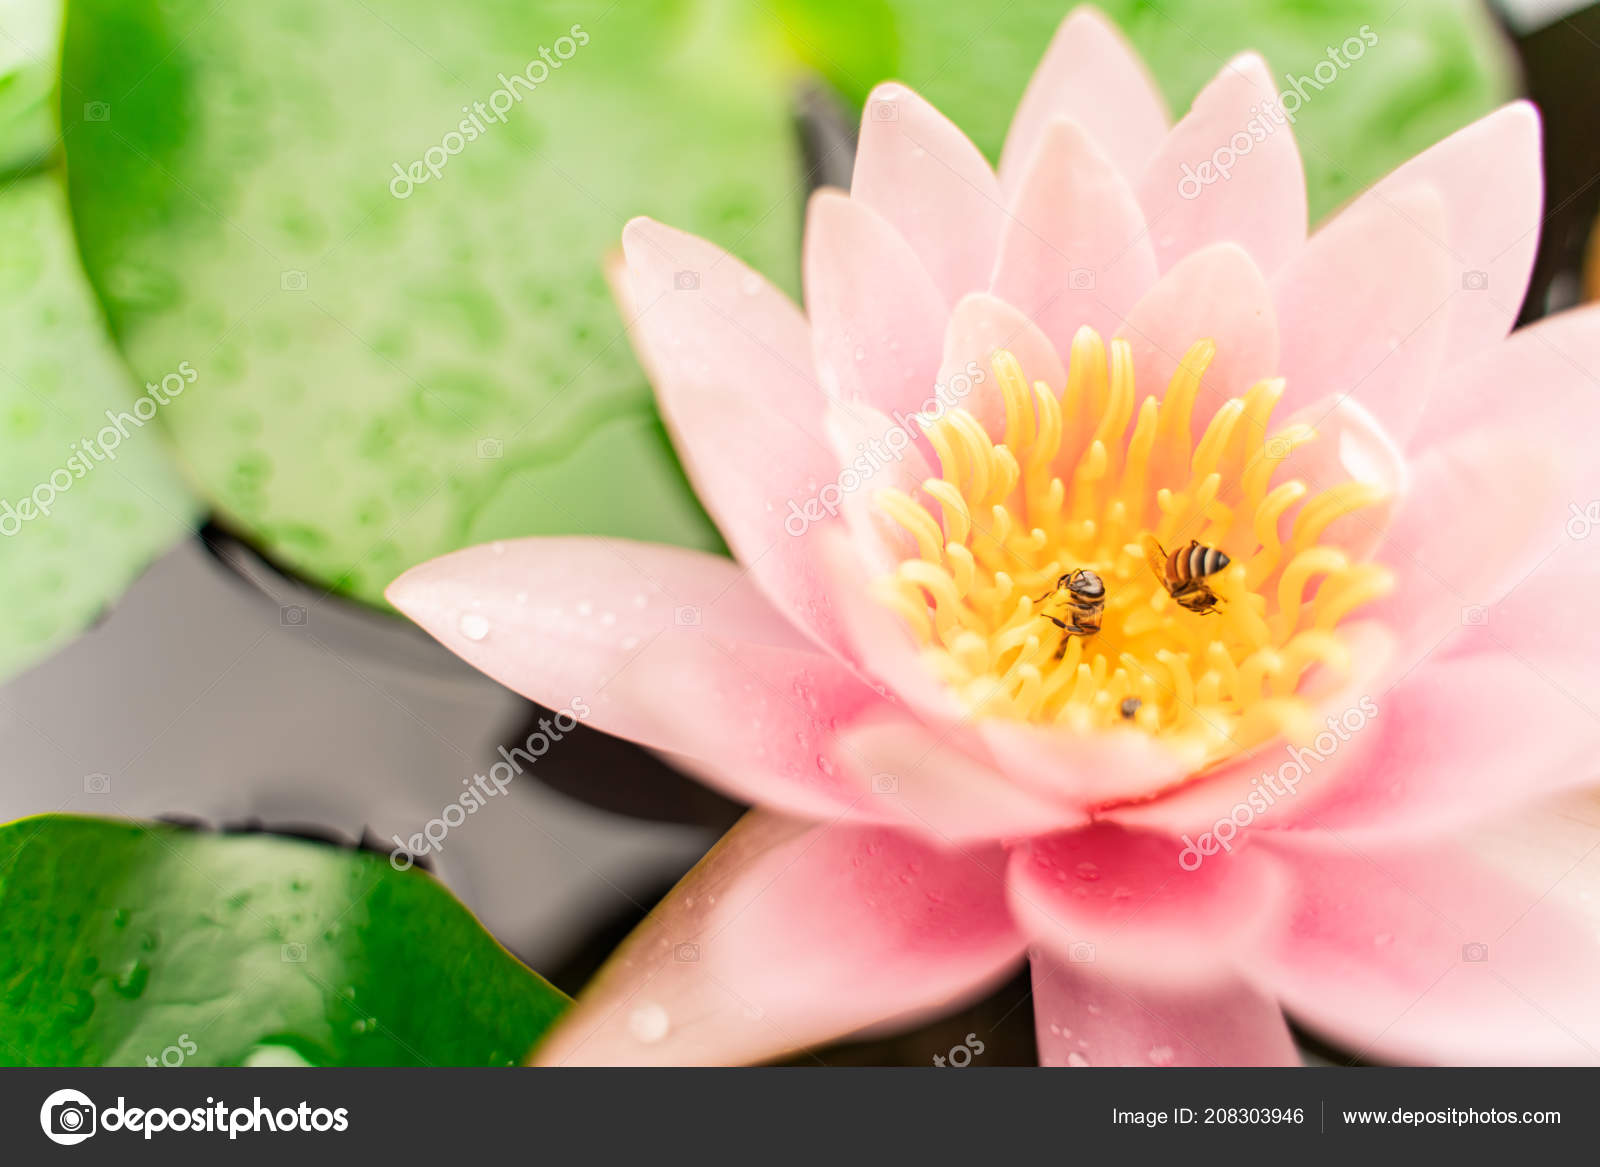 Beautiful lotus flower bee water rain garden stock photo beautiful lotus flower bee water rain garden stock photo izmirmasajfo